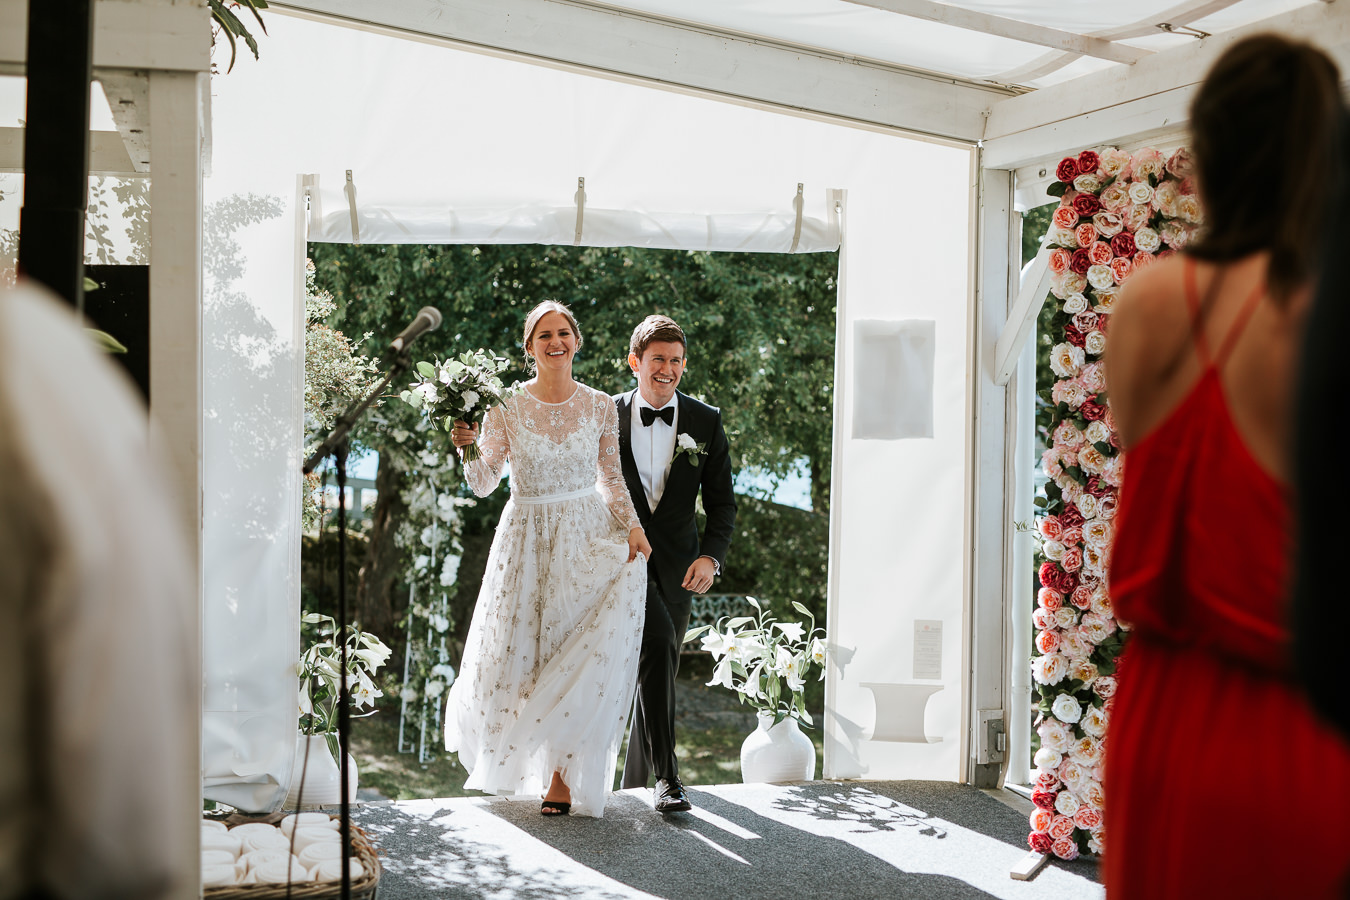 Bryllup-Hellviktangen-fotograf-tvedt-145.jpg